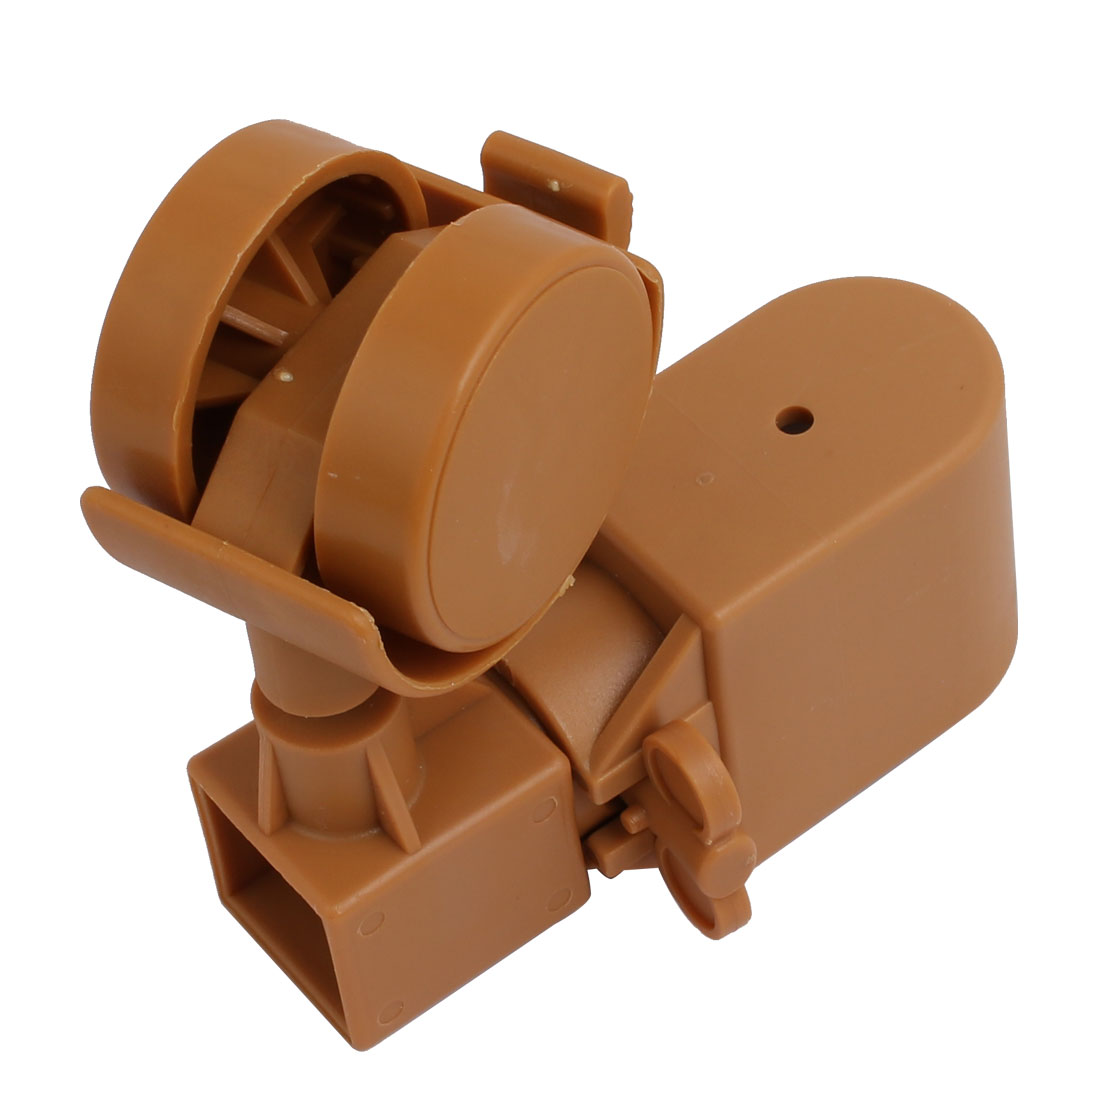 2pcs 1.5-inch Dia Plastic Swivel Caster Wheel  Fittings w Brake - image 2 of 4